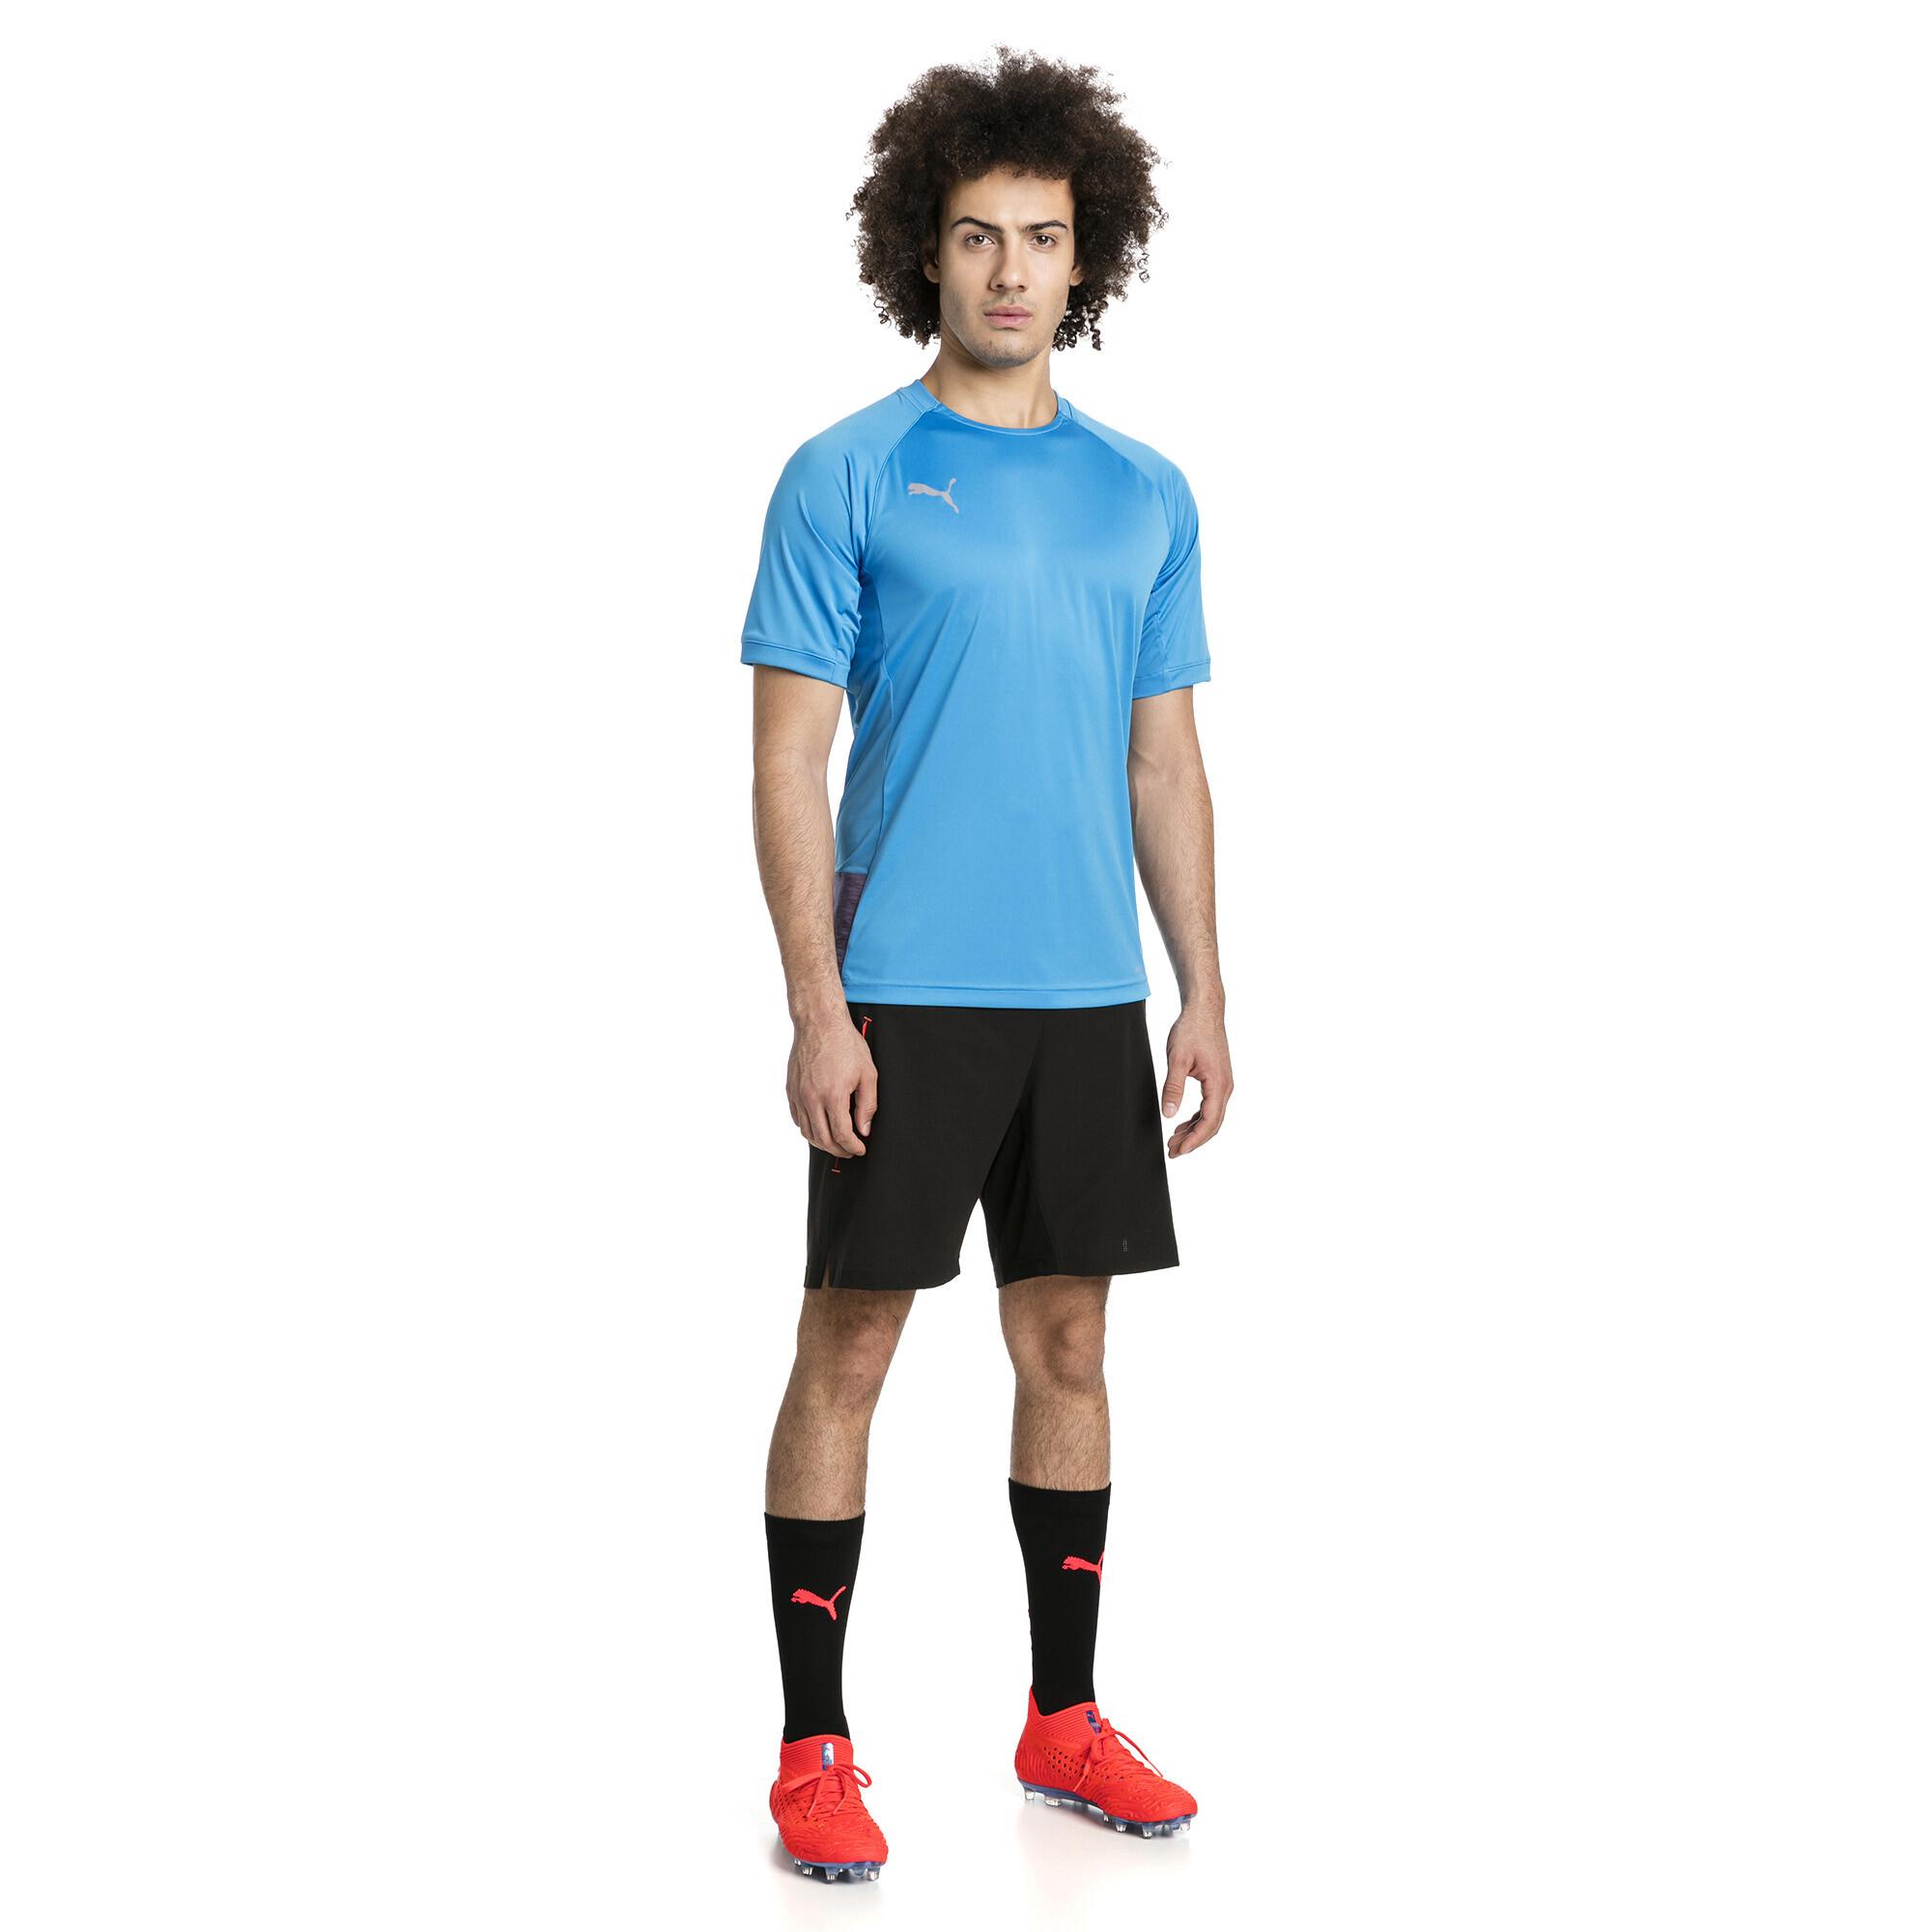 Image Puma ftblNXT Pro Short Sleeve Men's Football Tee #3